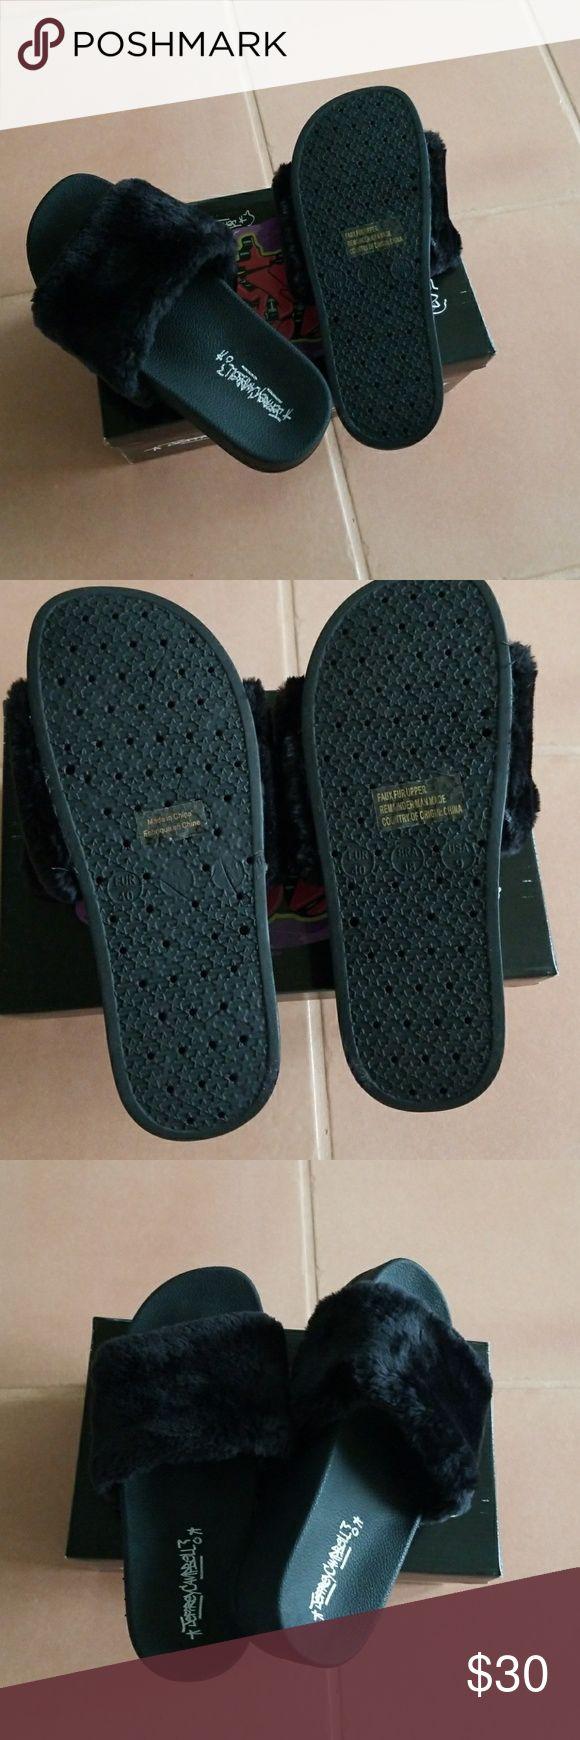 Jeffrey Campbell Lucky Me Platform Faux Fur slides Sporty Jeffrey Campbell slides with a plush faux-fur vamp. Cracked footbed and platform. Rubber sole. Jeffrey Campbell Shoes